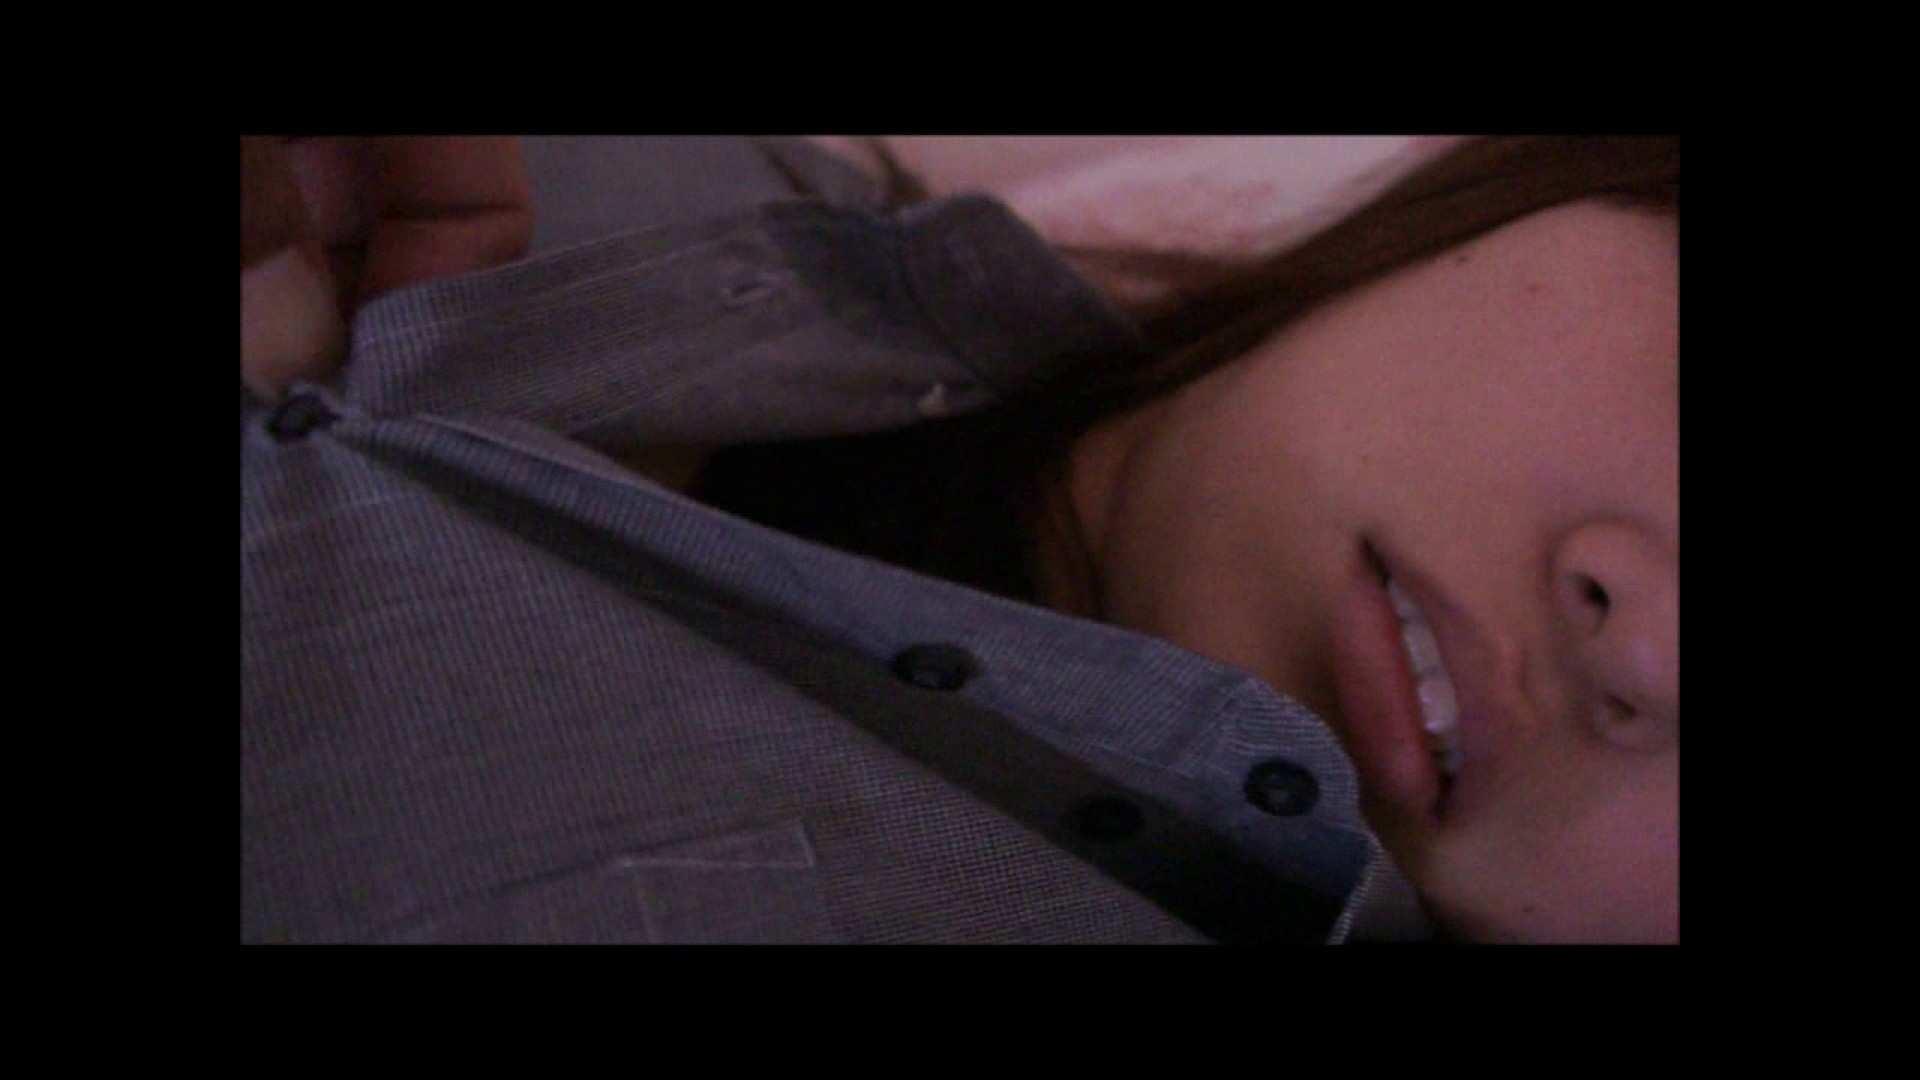 Vol.15 友人が抱く葵への感情・・・弄ばれた巨乳。 友人 アダルト動画キャプチャ 111枚 41